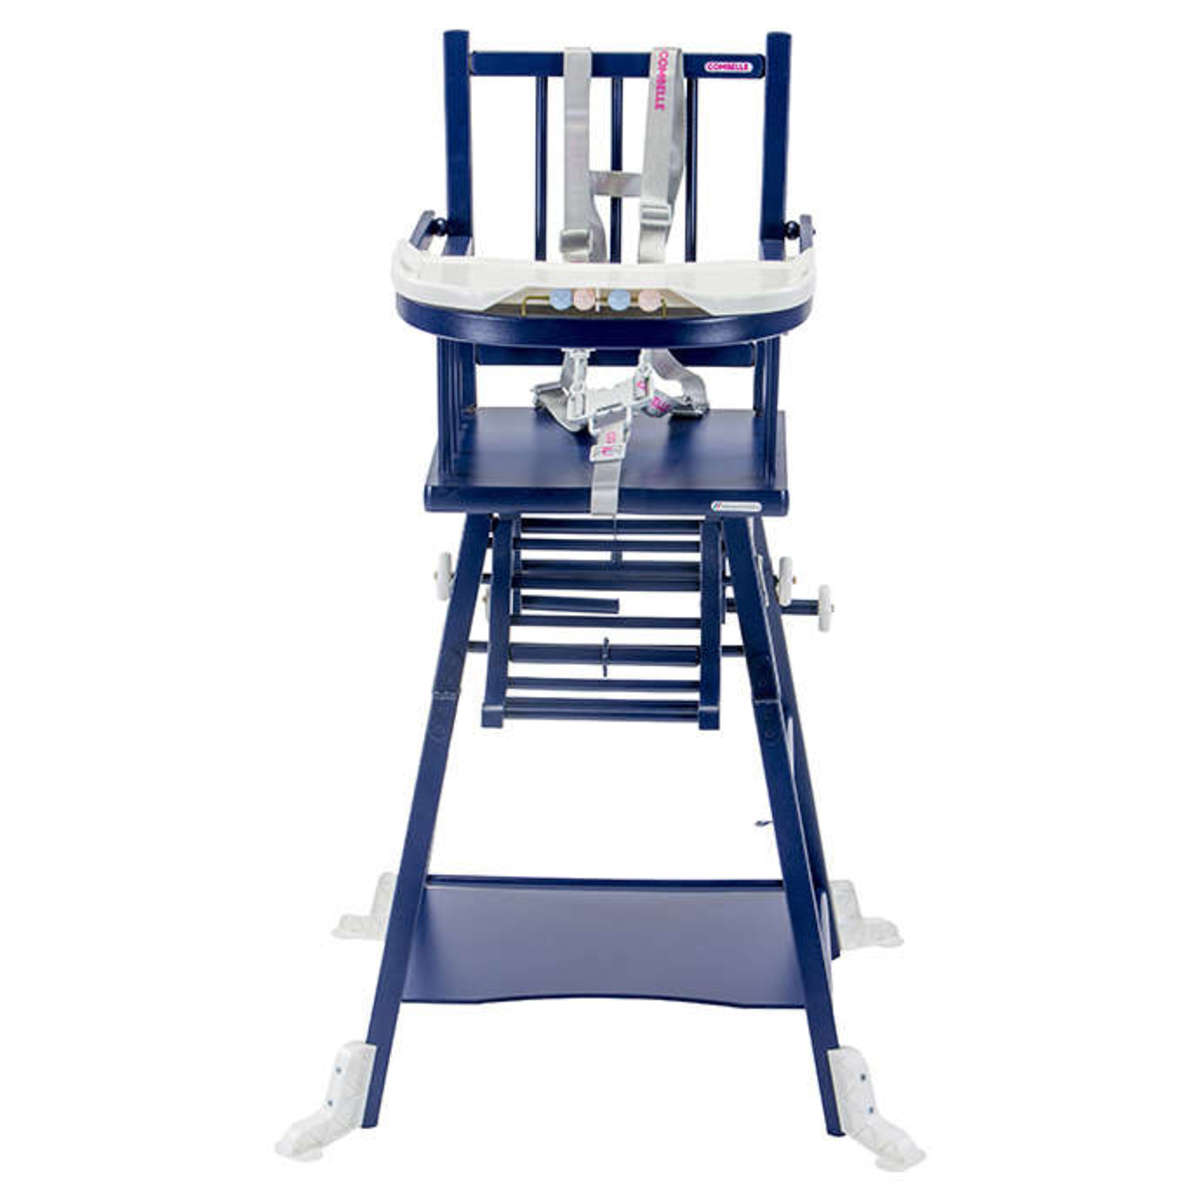 combelle chaise haute barreaux transformable marcel laqu bleu chaise haute combelle sur l. Black Bedroom Furniture Sets. Home Design Ideas